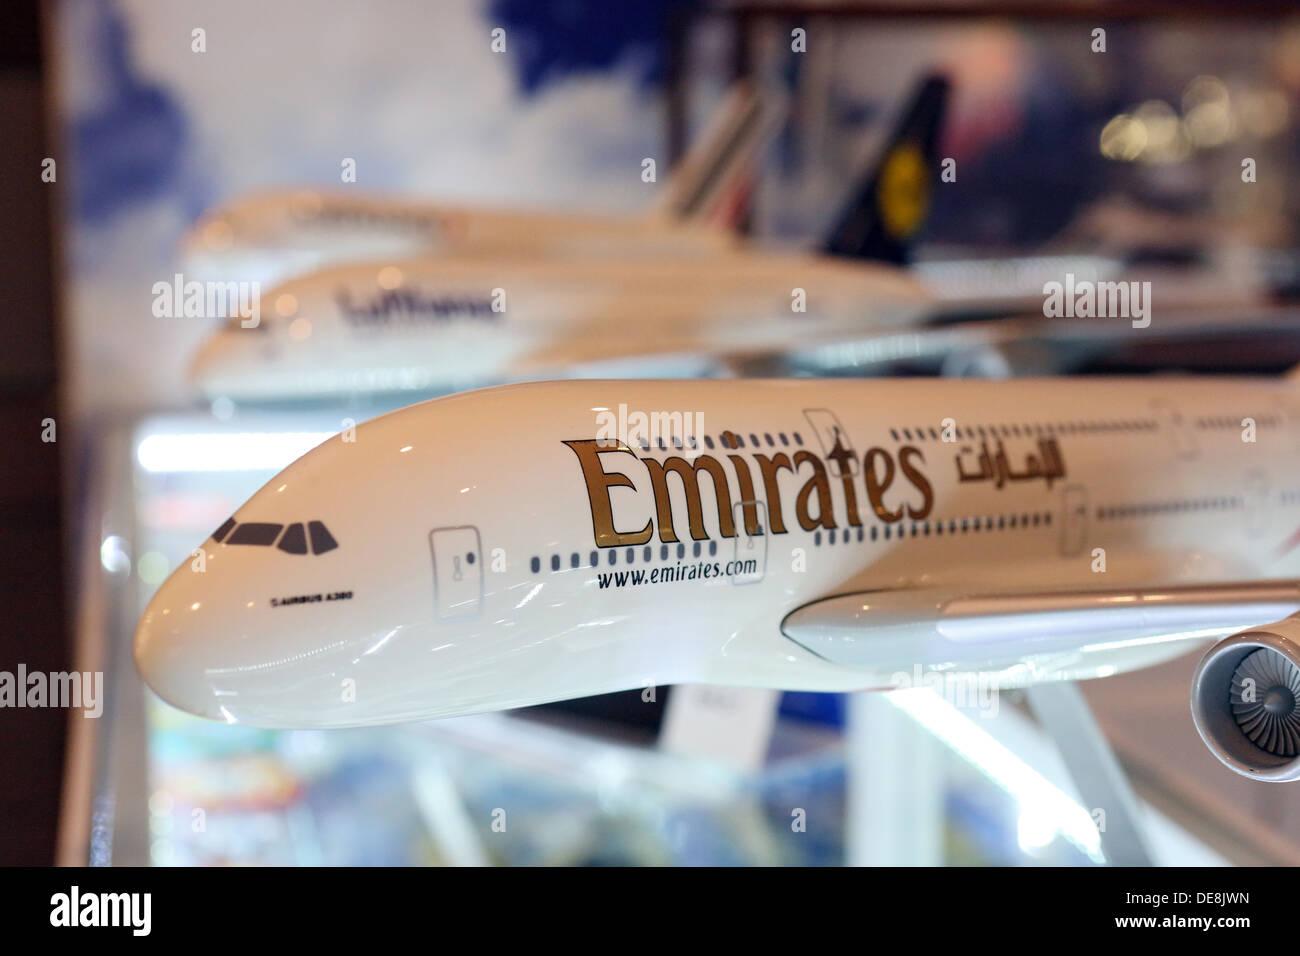 Dubai, United Arab Emirates, the Emirates airline plane model - Stock Image